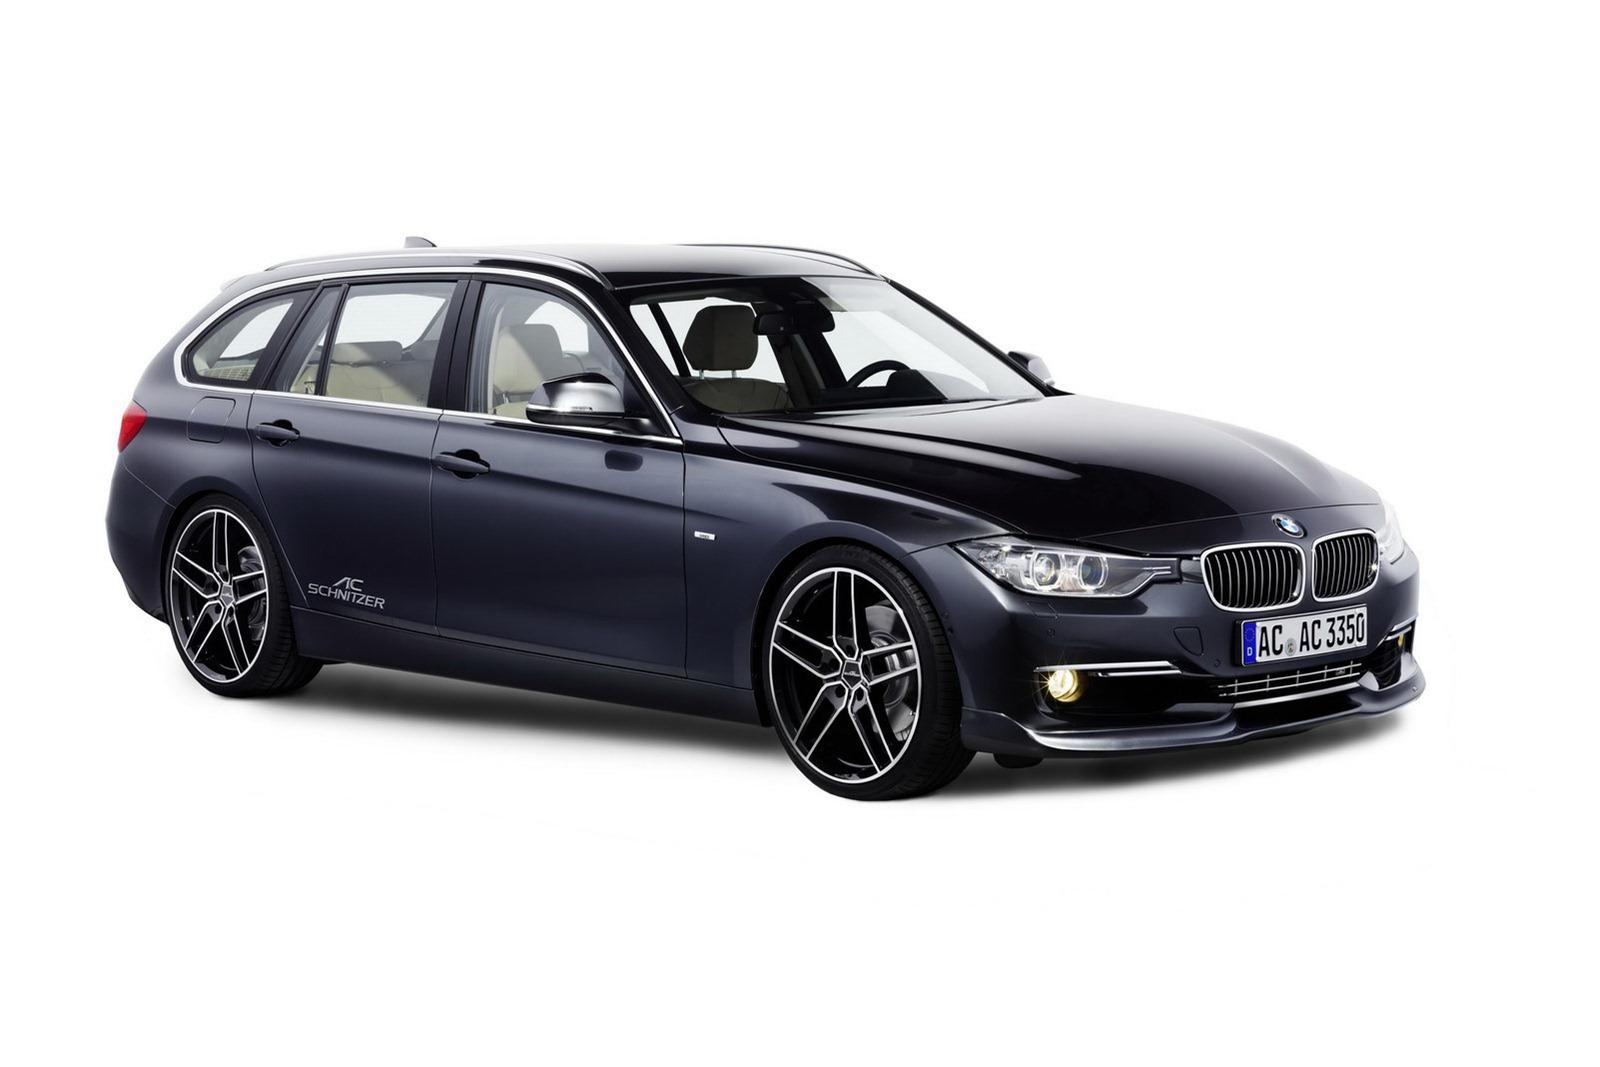 http://3.bp.blogspot.com/-Dd46kT-CEO0/UG1TRxJUPWI/AAAAAAAAiCc/gGIvas6fUp4/s1600/BMW-3-Series-F31-1%255B5%255D.jpg